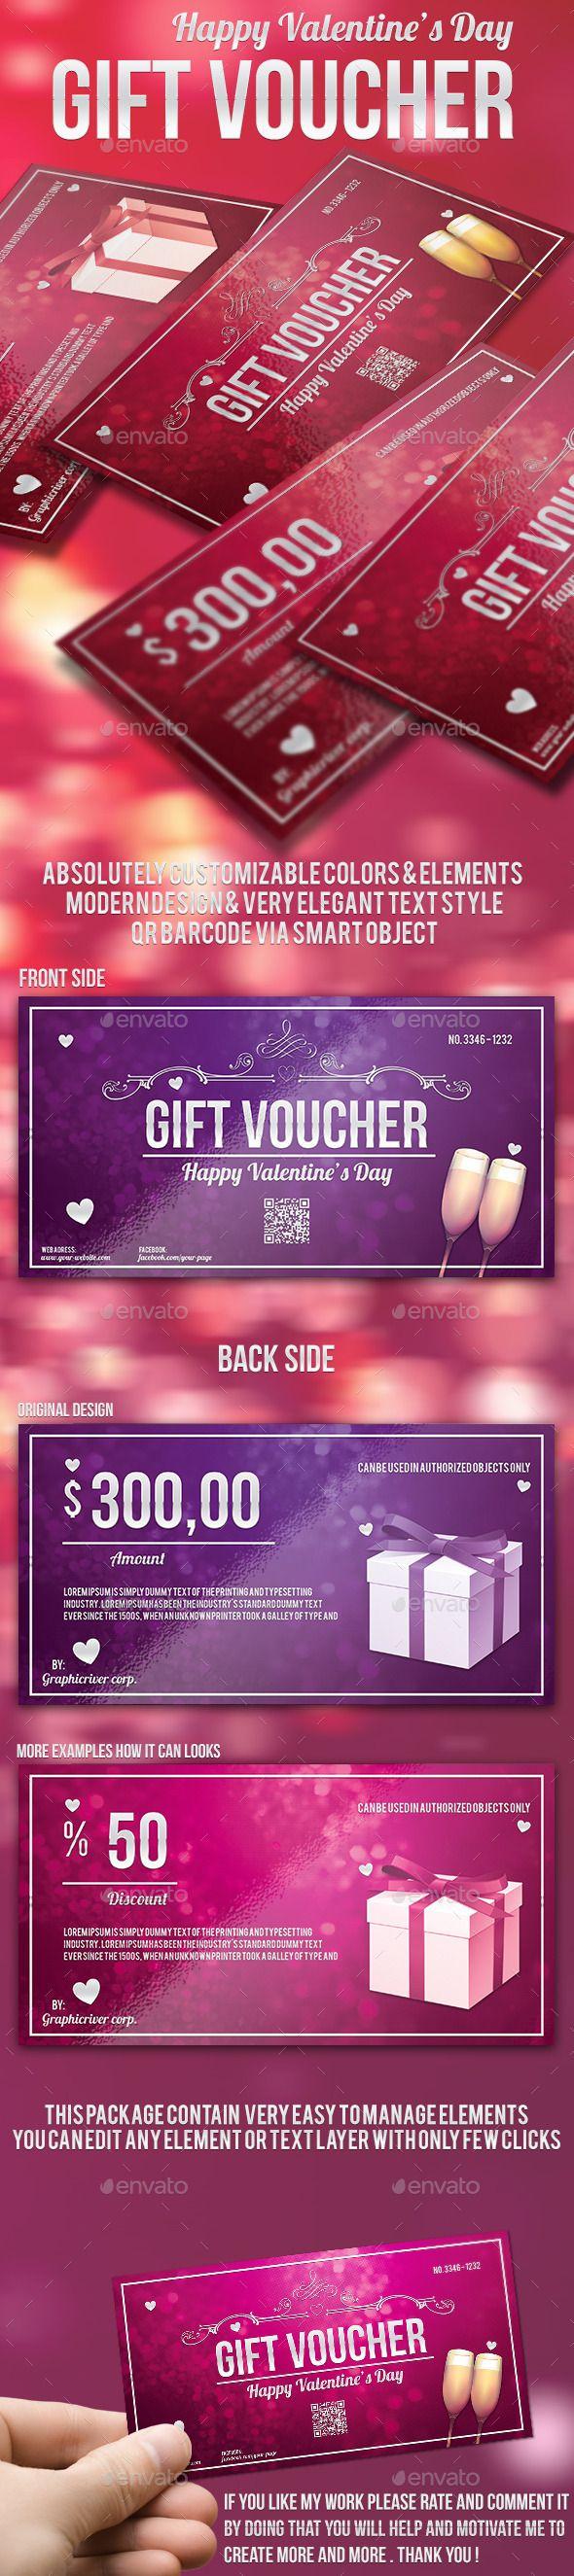 34 best voucher & sale design inspiration images on Pinterest | Gift ...